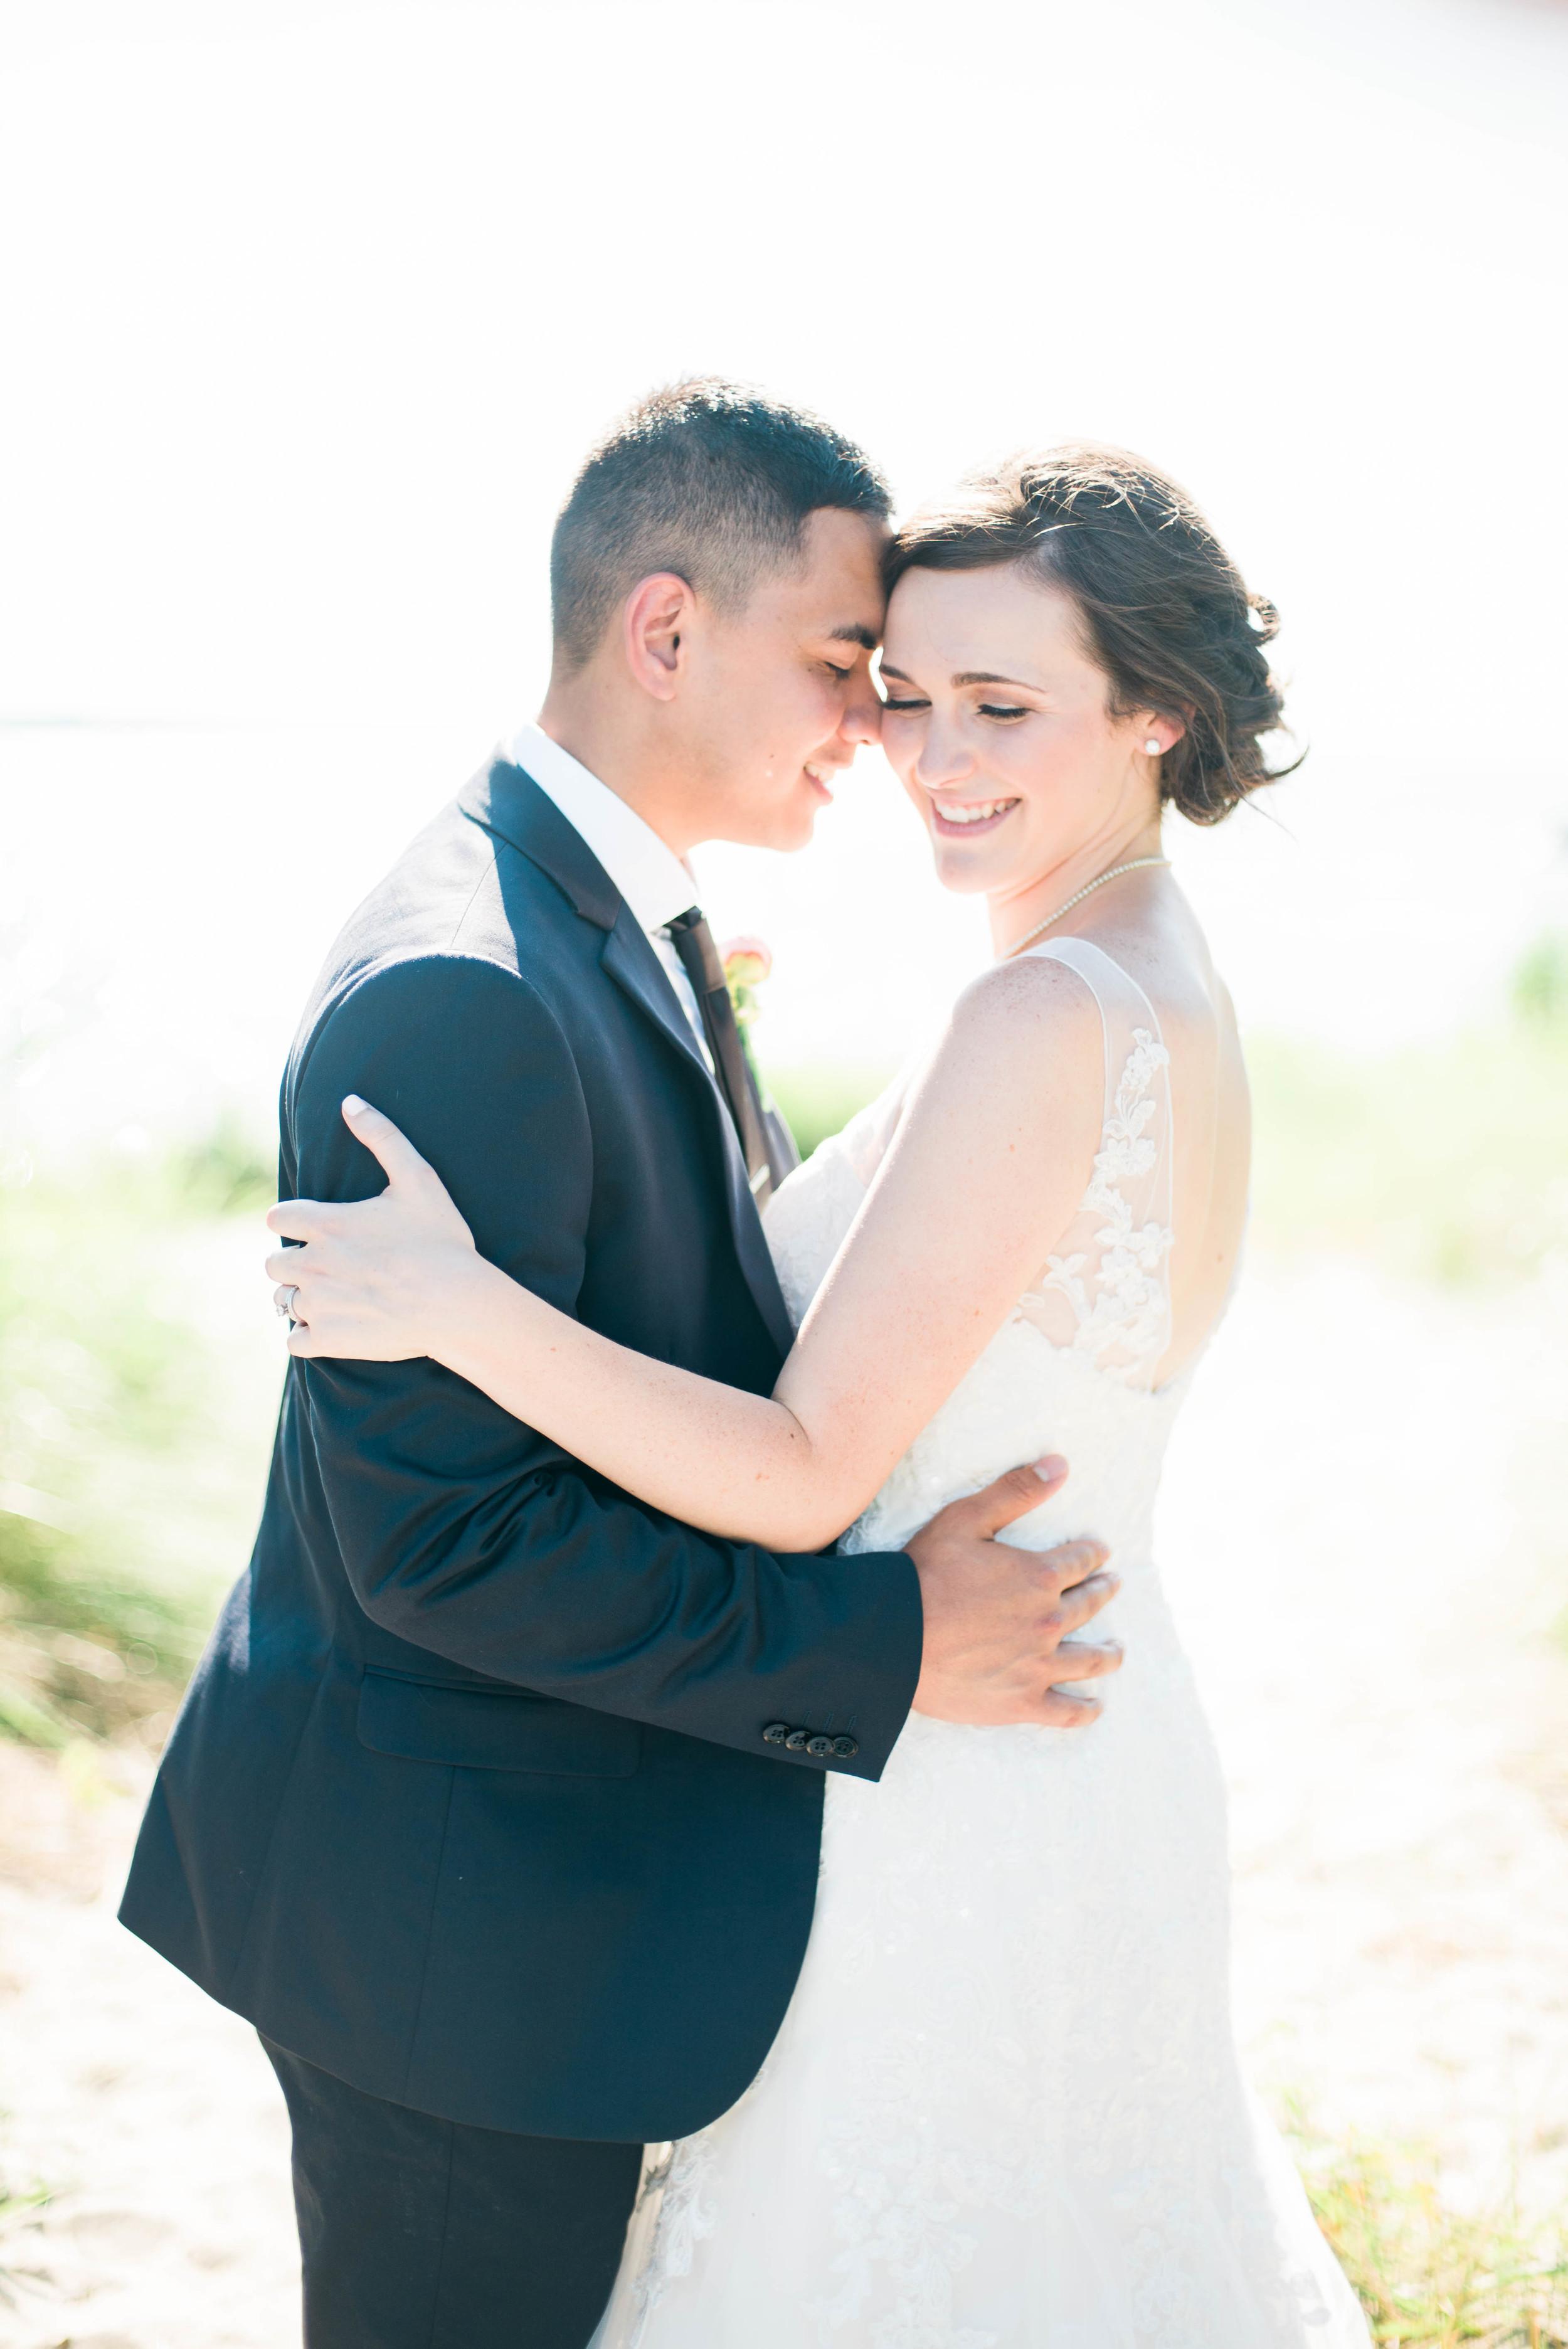 PREVIEWremowedding2016-48.jpg